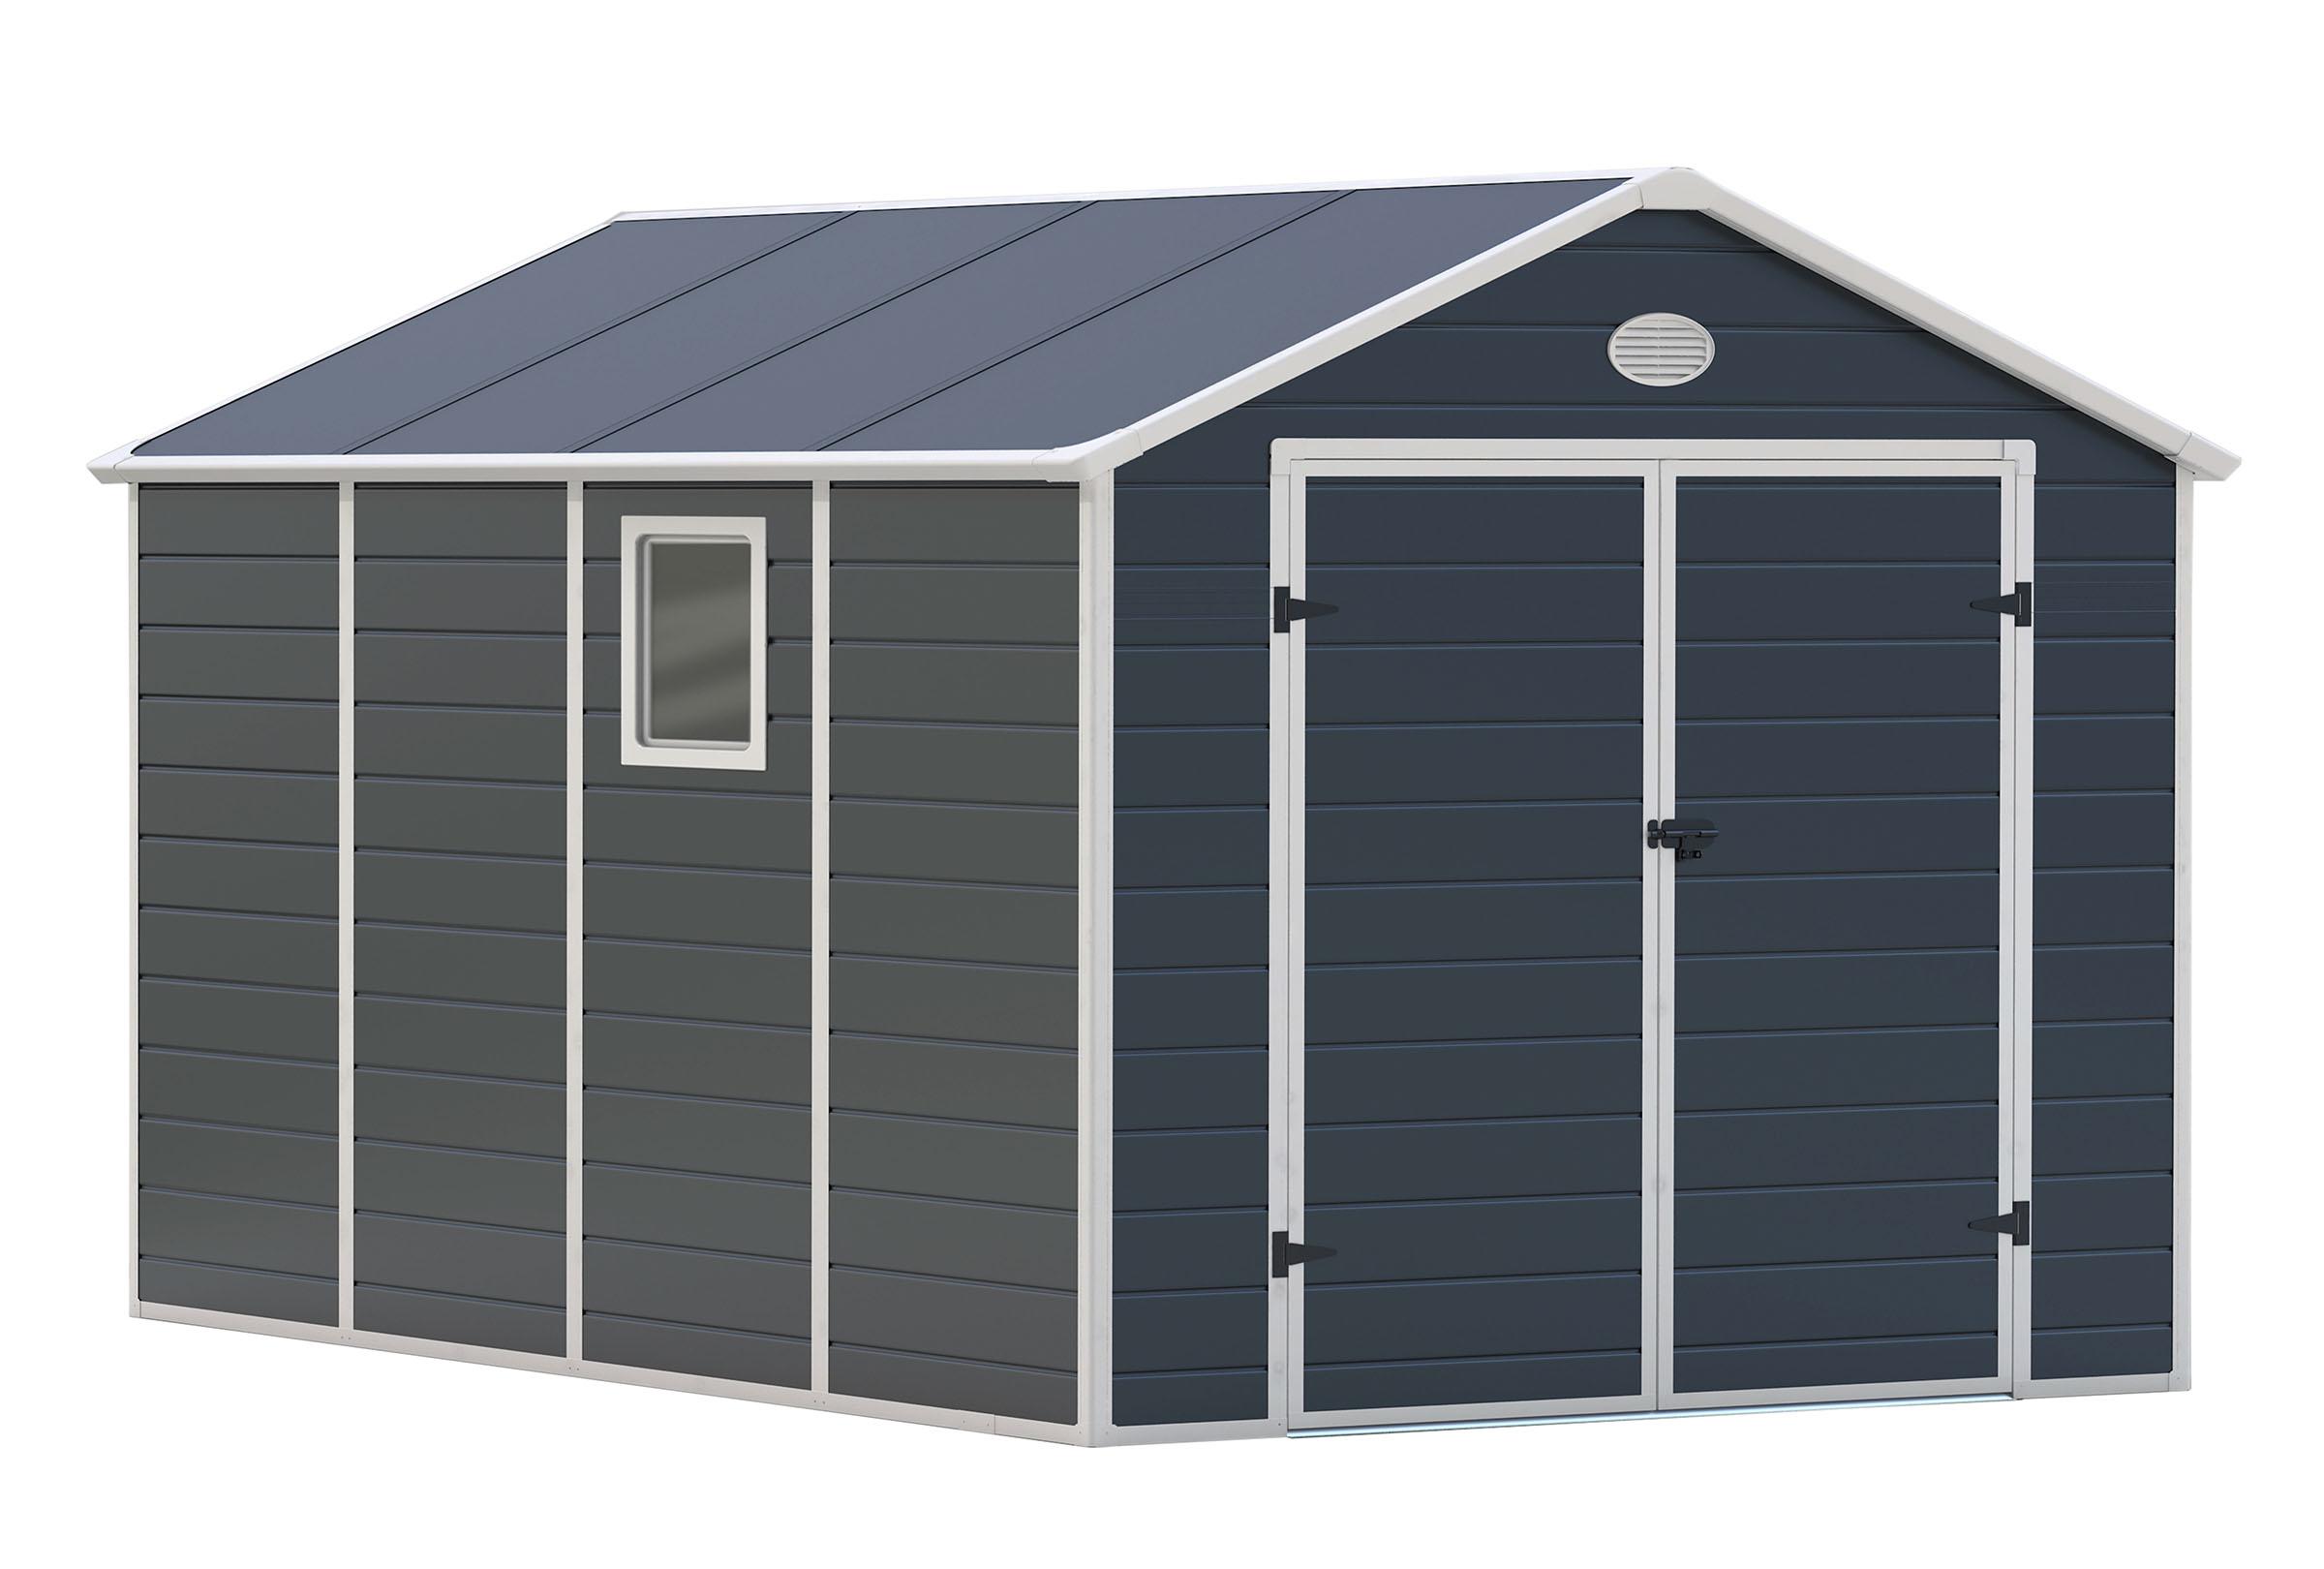 Zahradní domek G21 PAH 882 - 241 x 366 cm, plastový, šedý